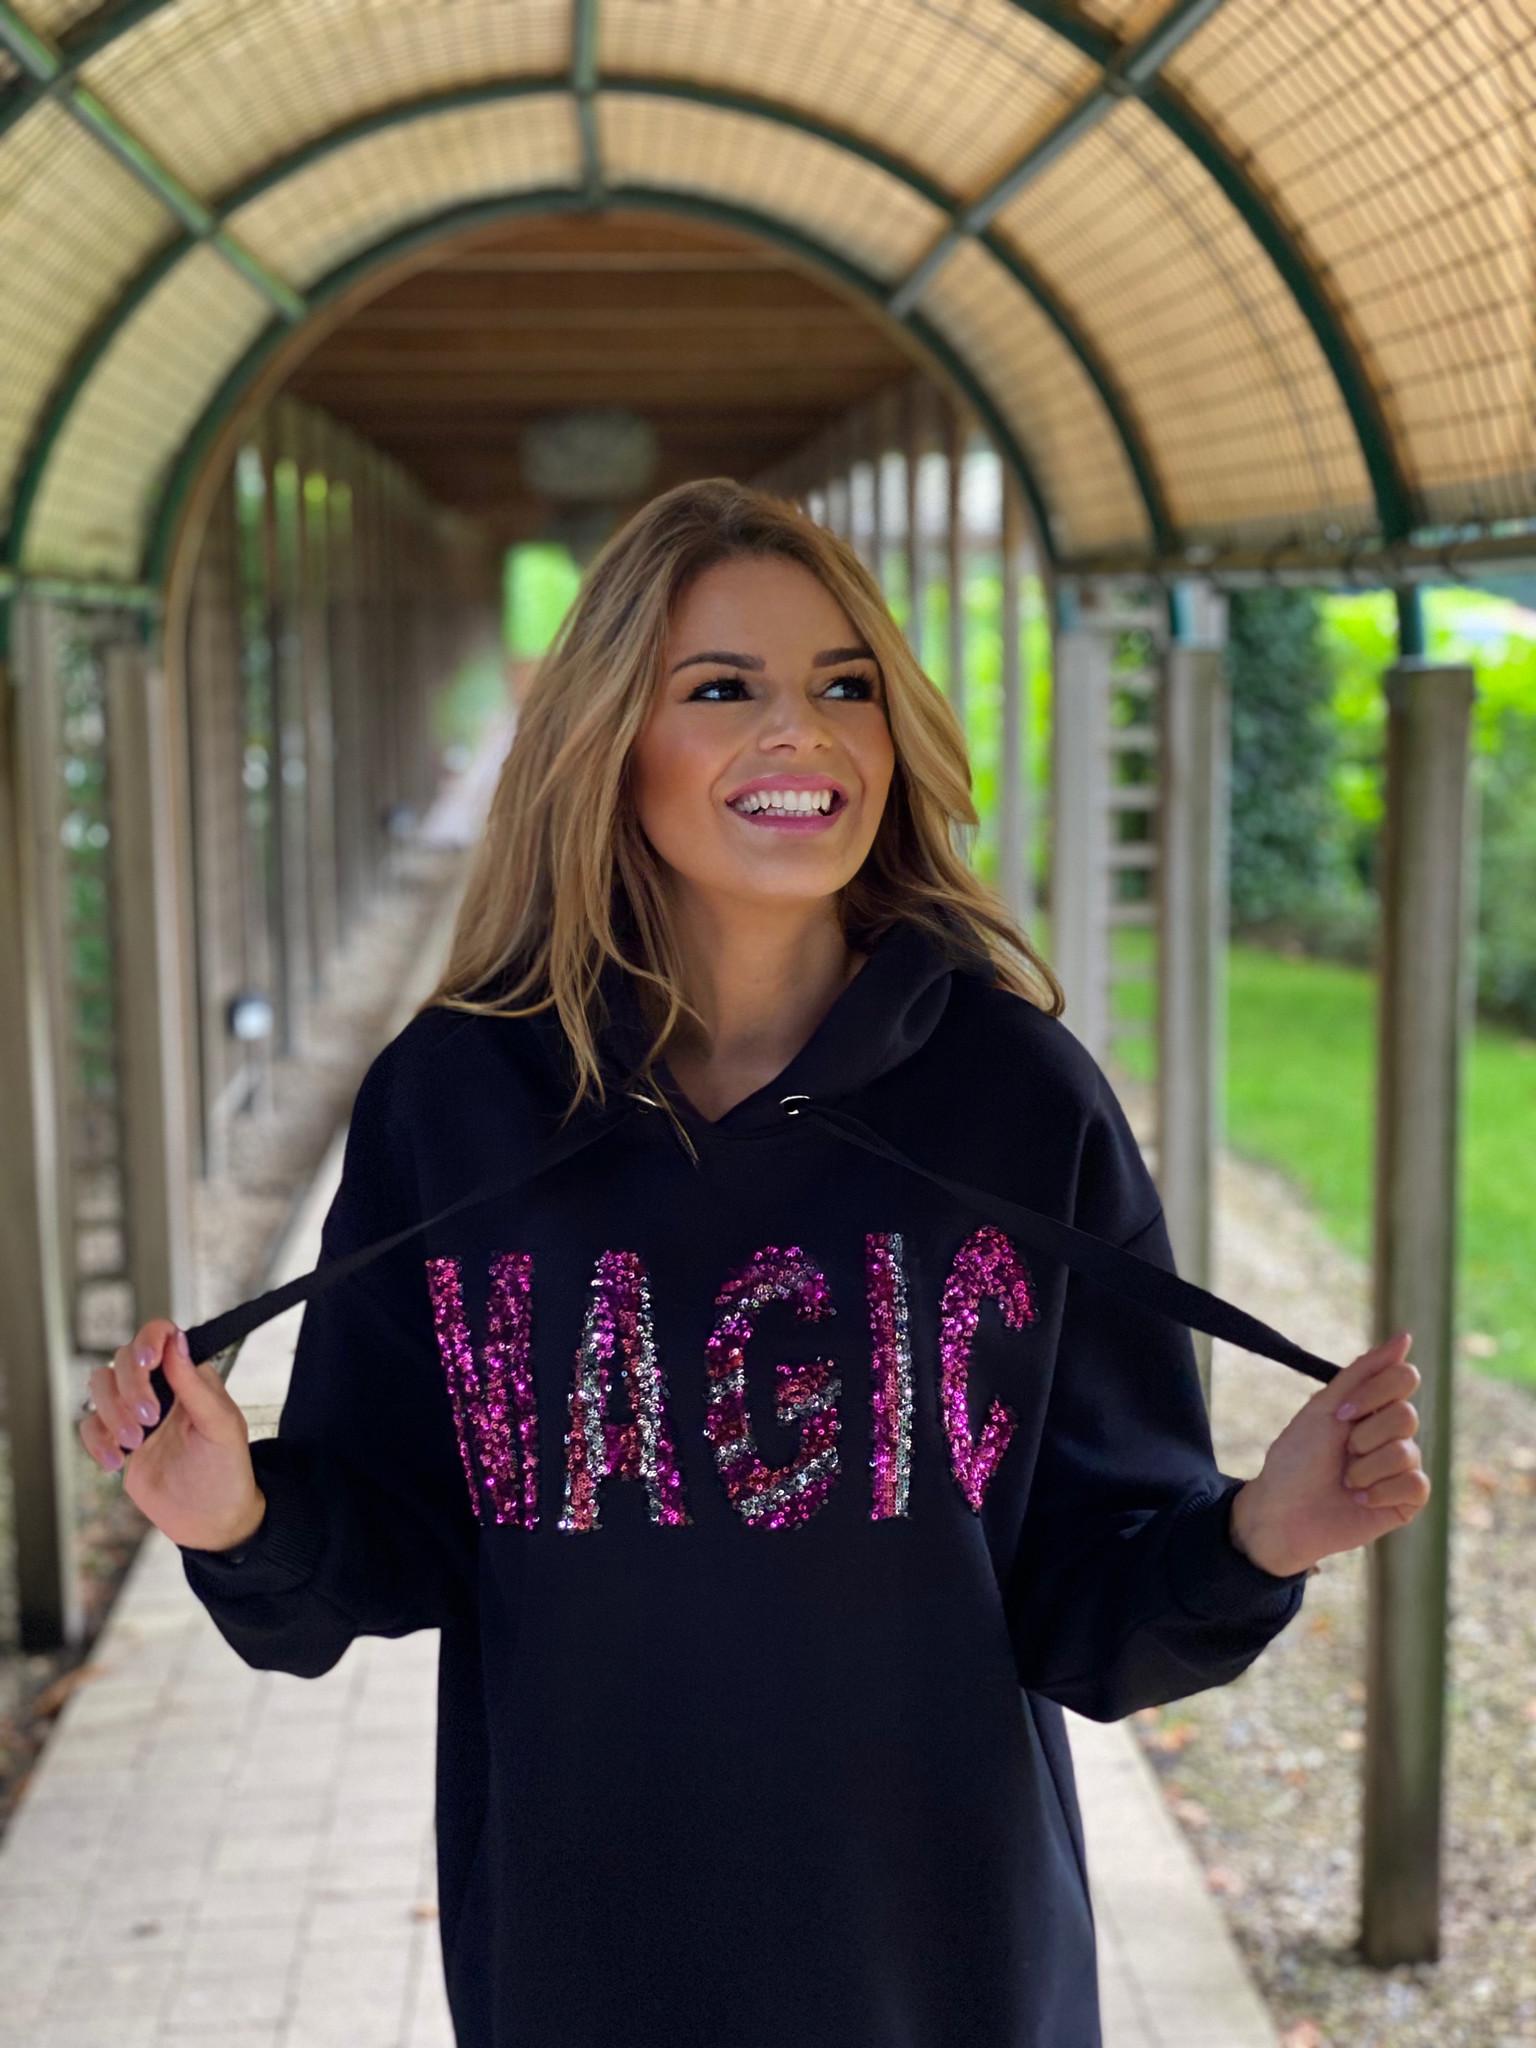 YENTLK Magic Sweater Paillettes